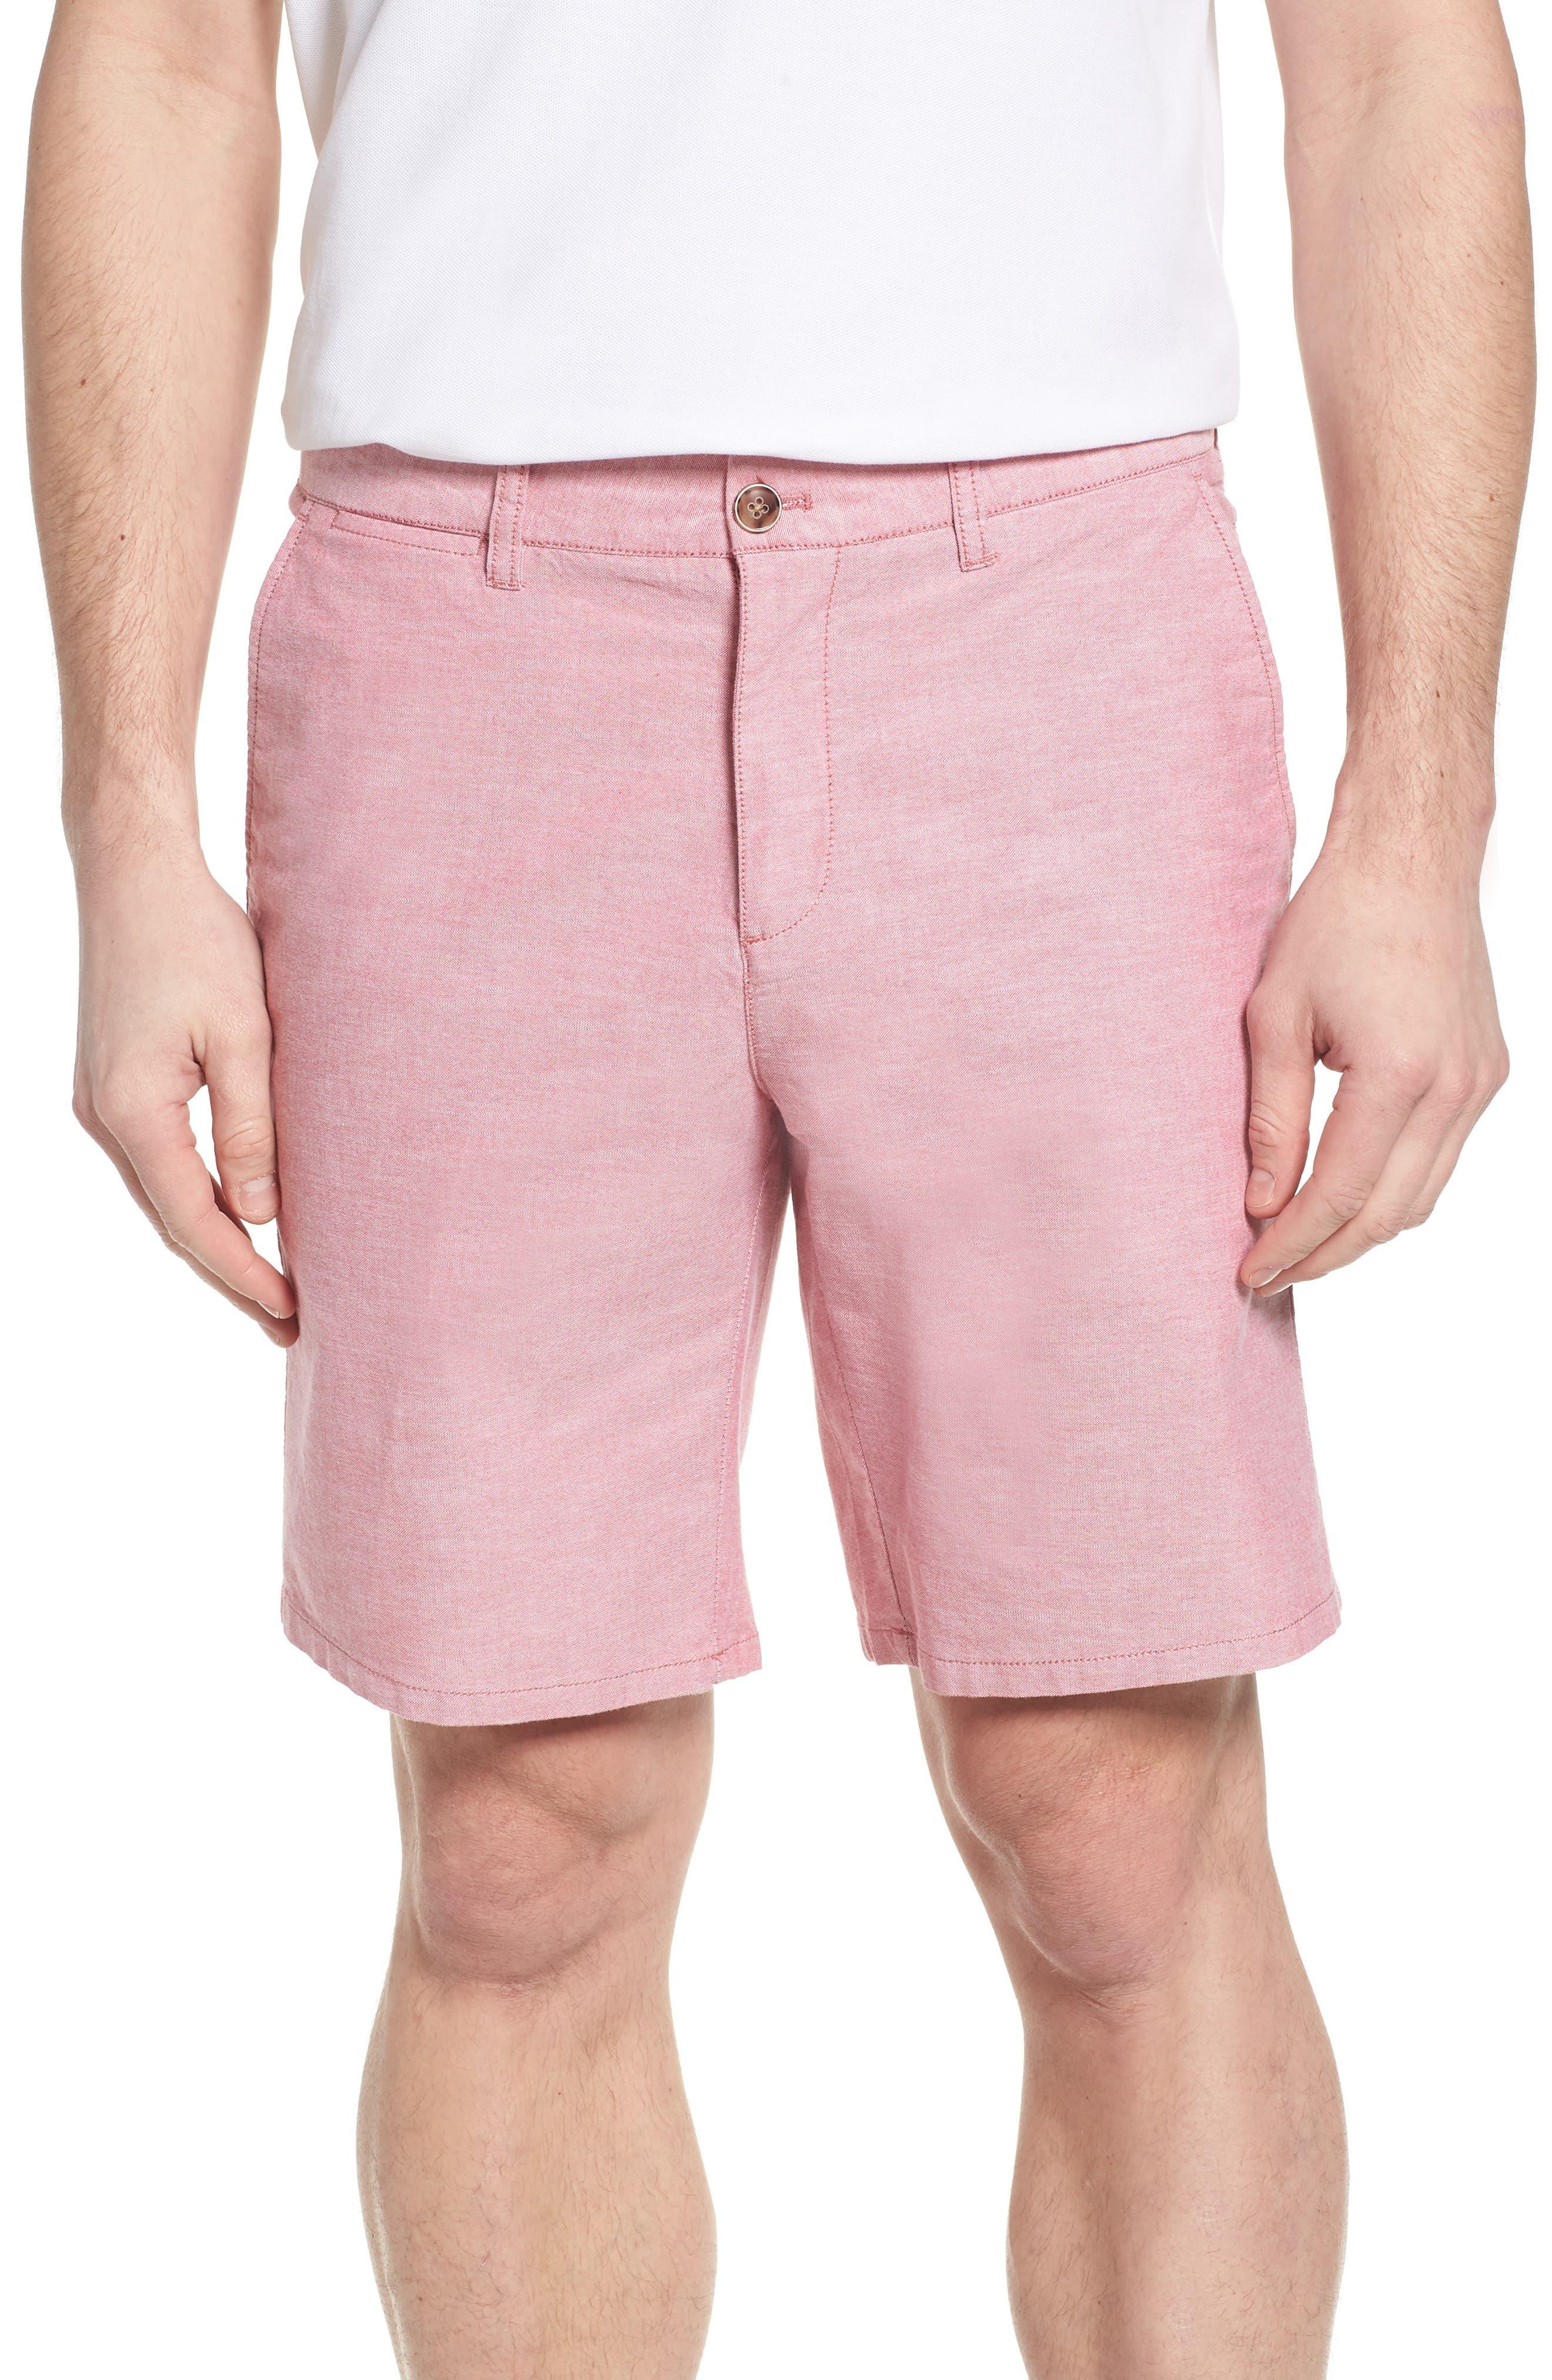 Merritt Regular Fit Shorts,                         Main,                         color, Malibu Red